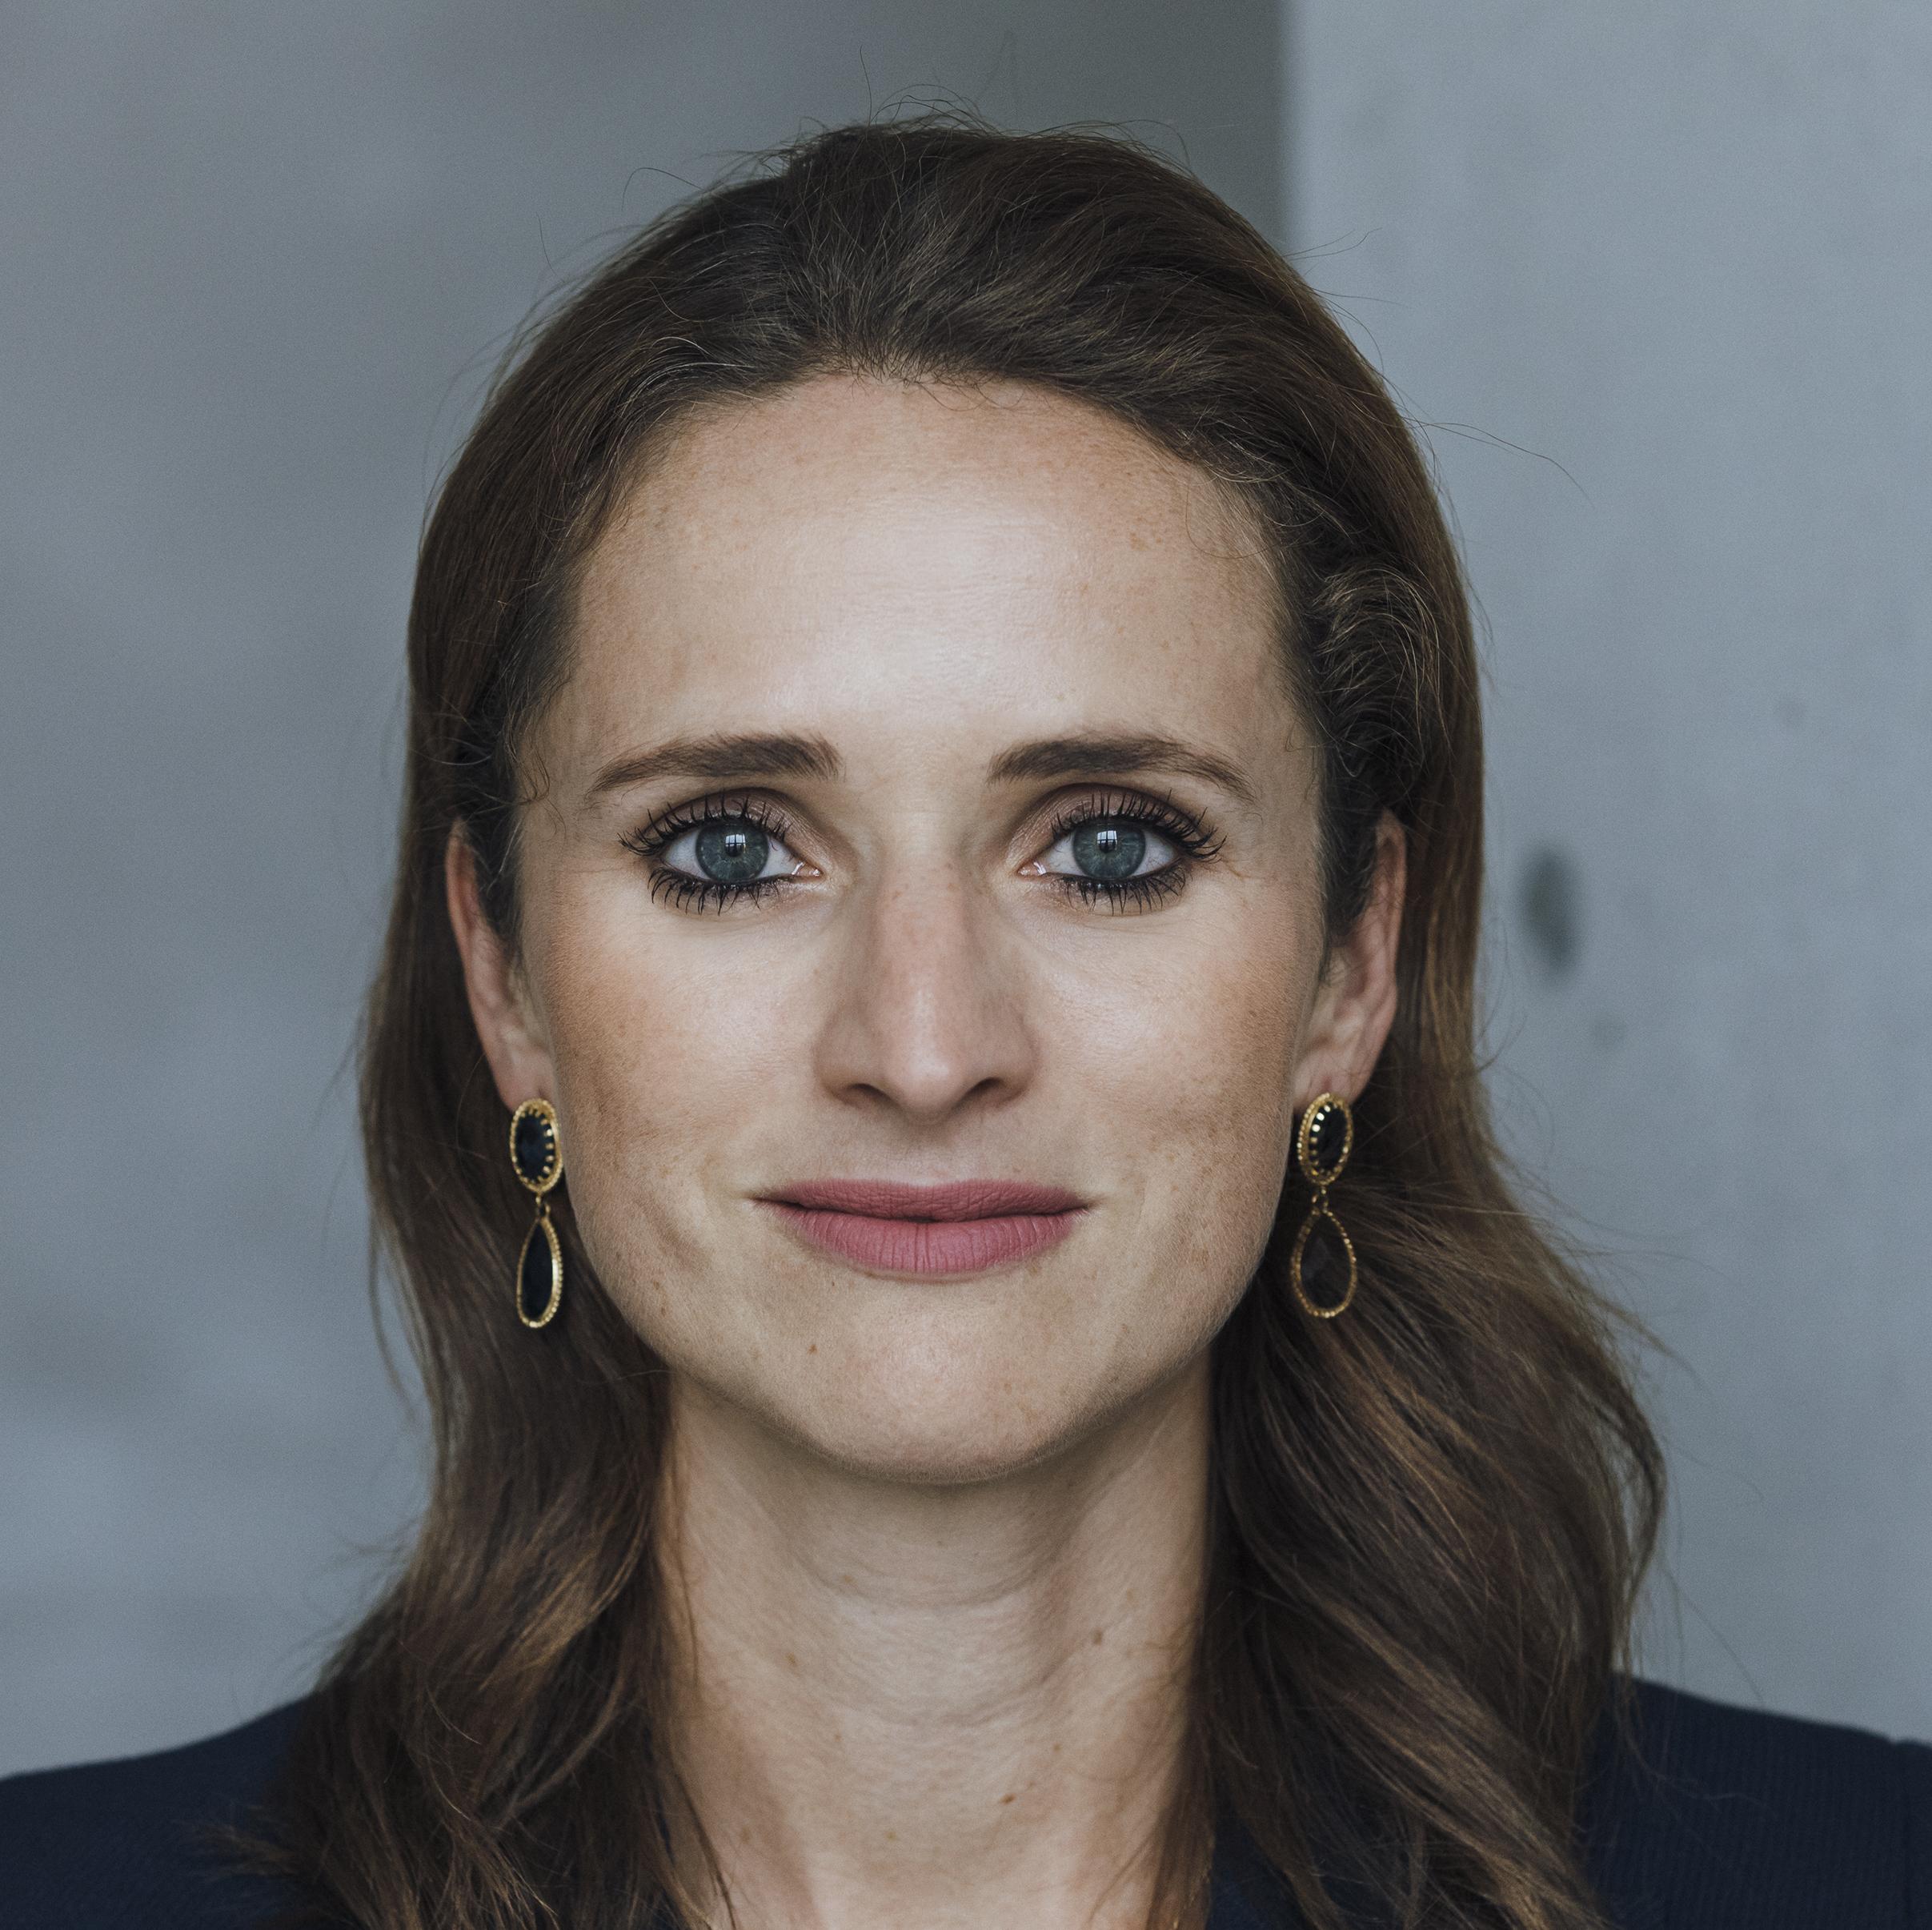 Verena Pausder